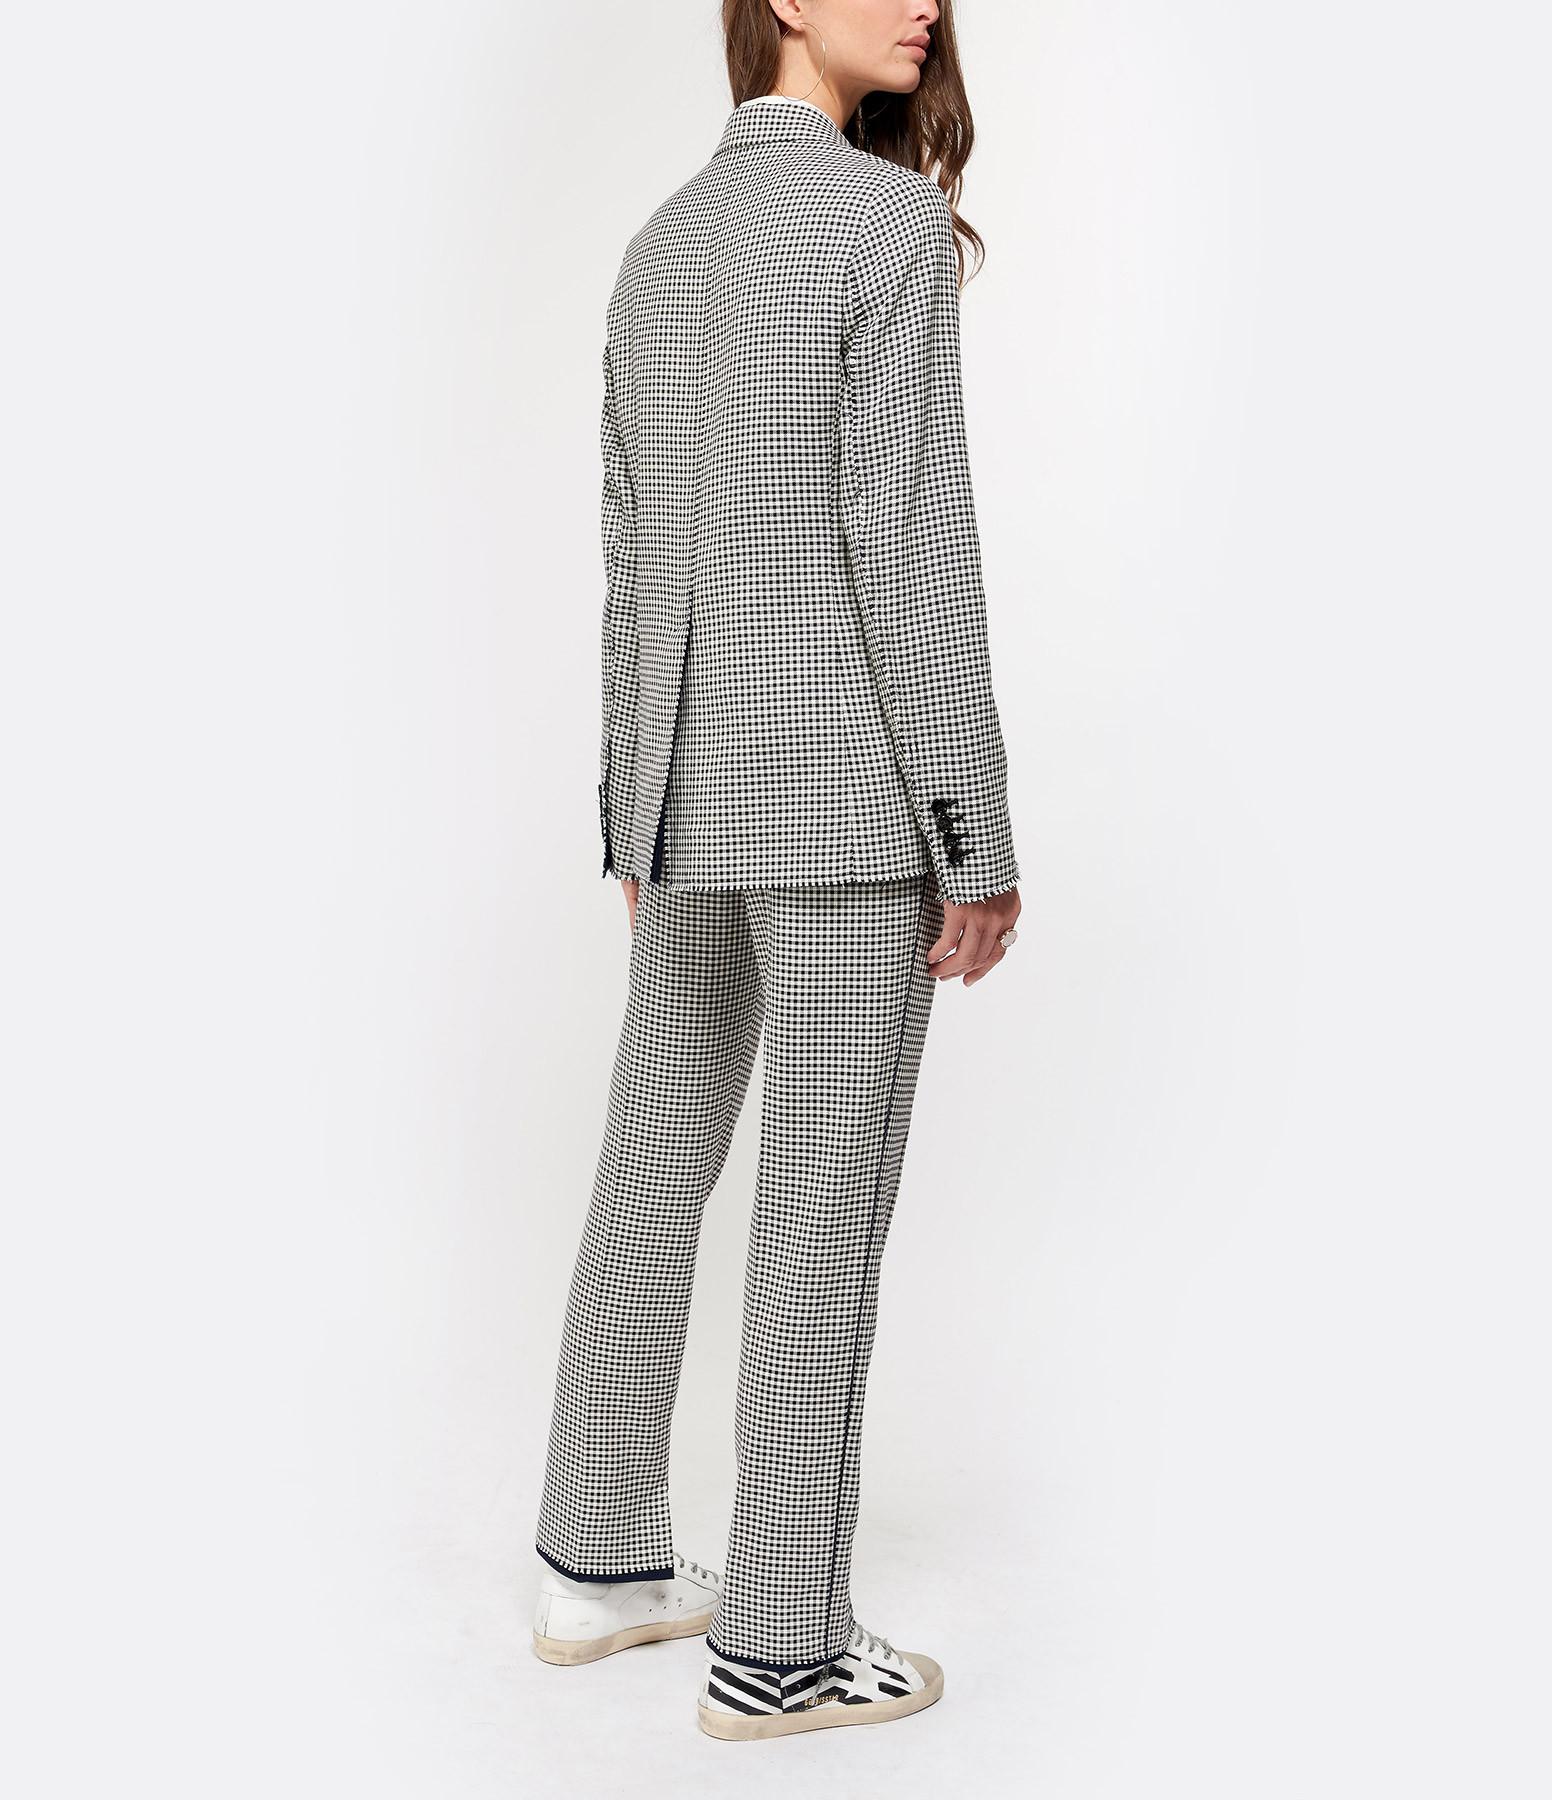 GOLDEN GOOSE - Pantalon Minori Imprimé Blanc Navy